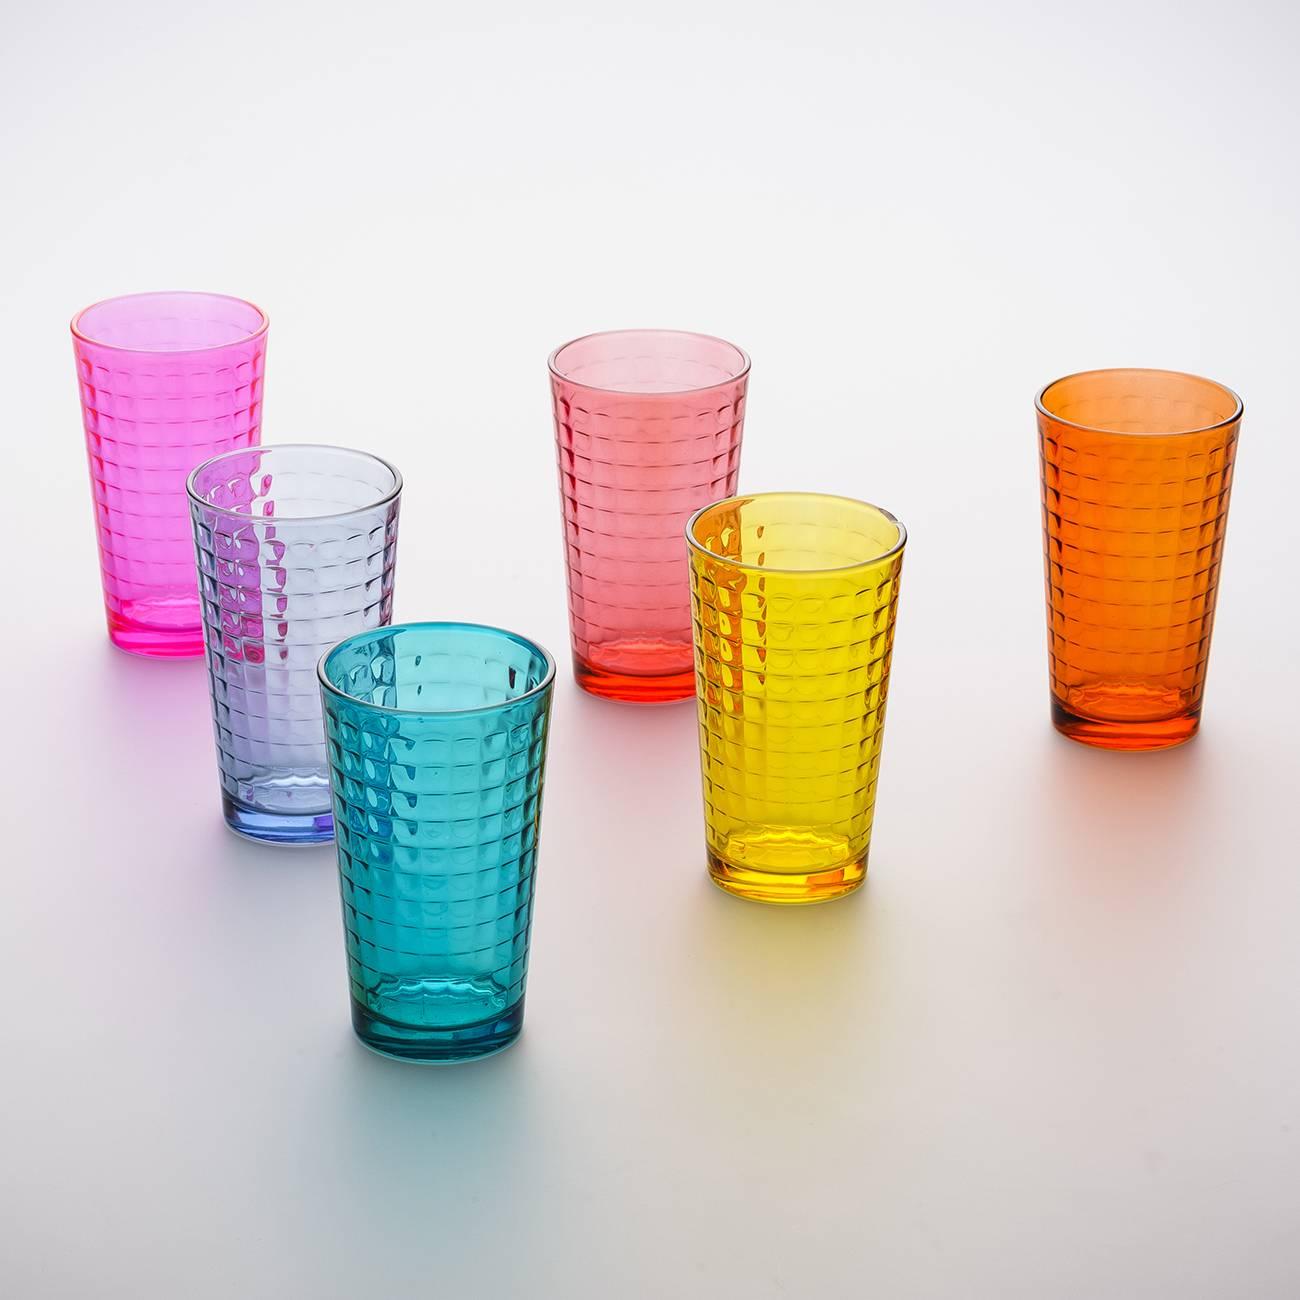 Conjunto 6 Copos Xadrez Coloridos - 325 ml - em Vidro - Bon Gourmet